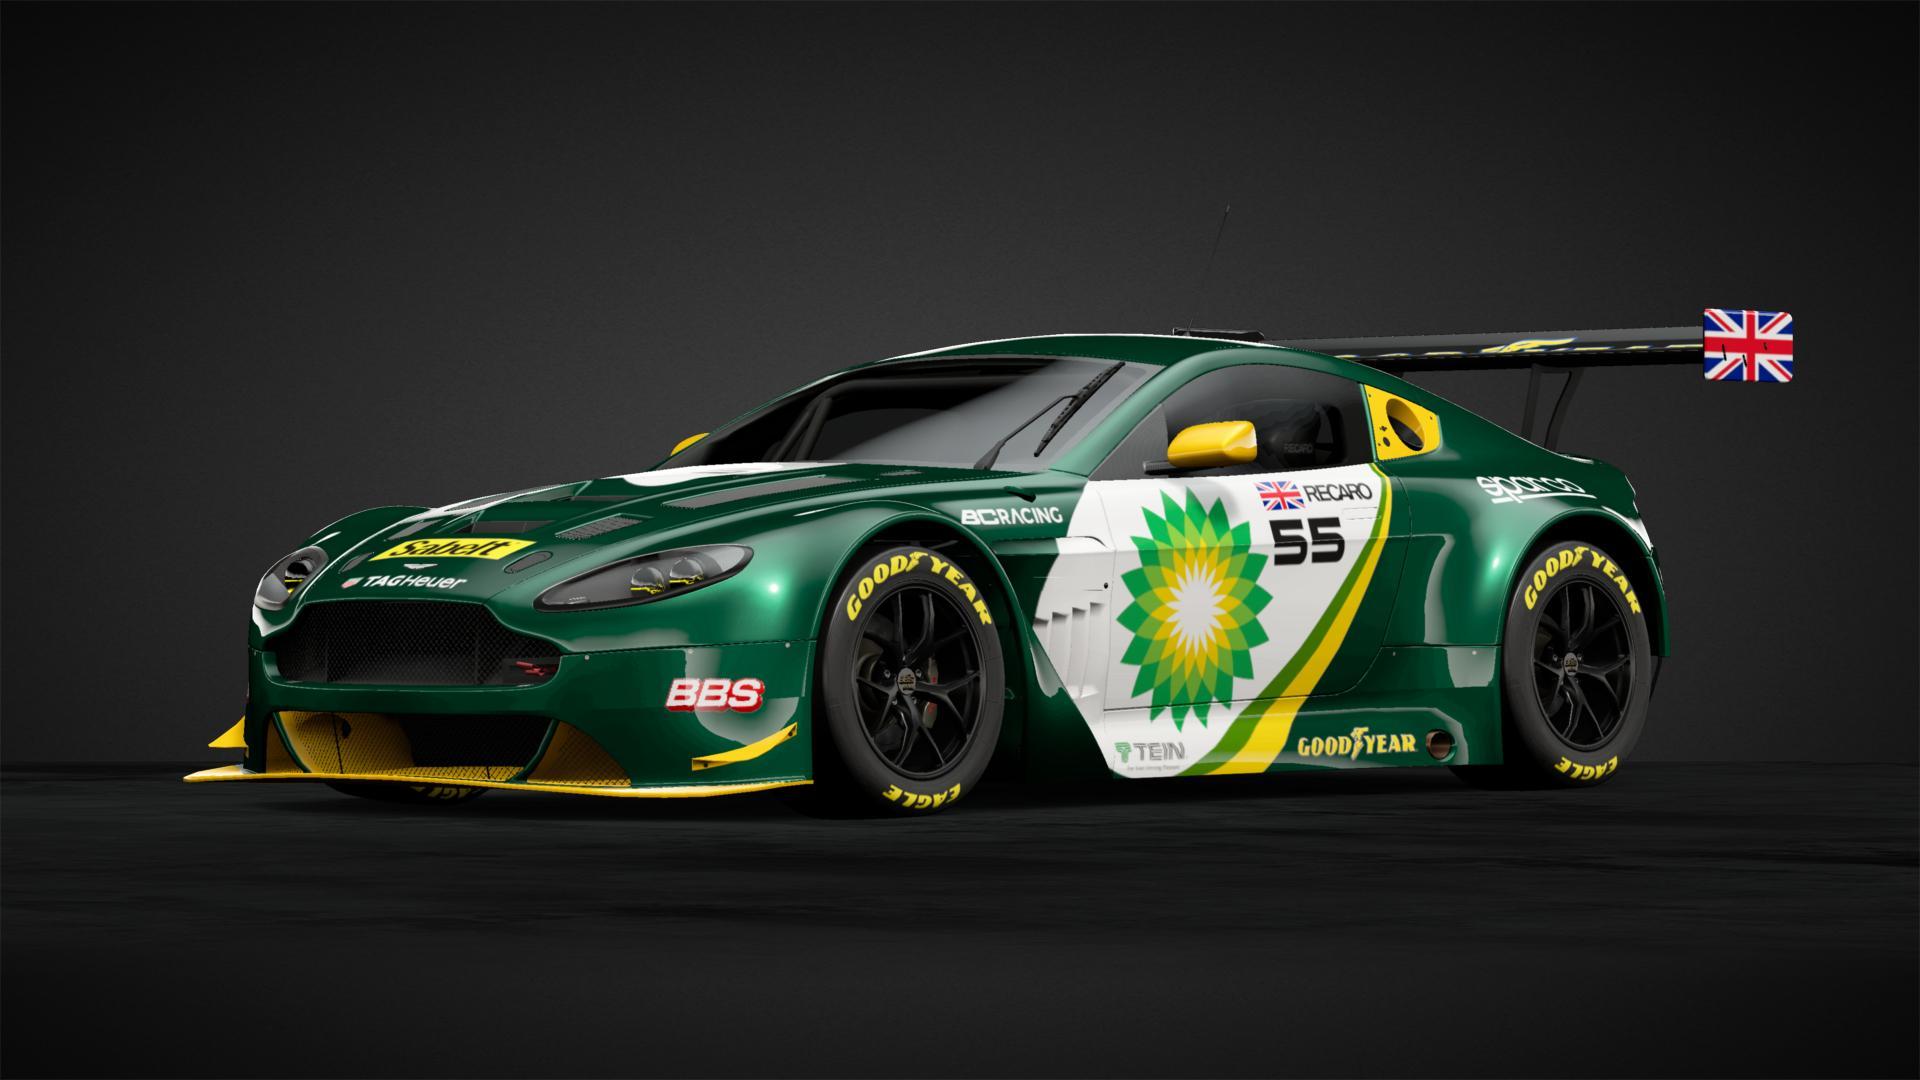 Aston Martin Bp Gb Car Livery By Callmesnake Iii Community Gran Turismo Sport